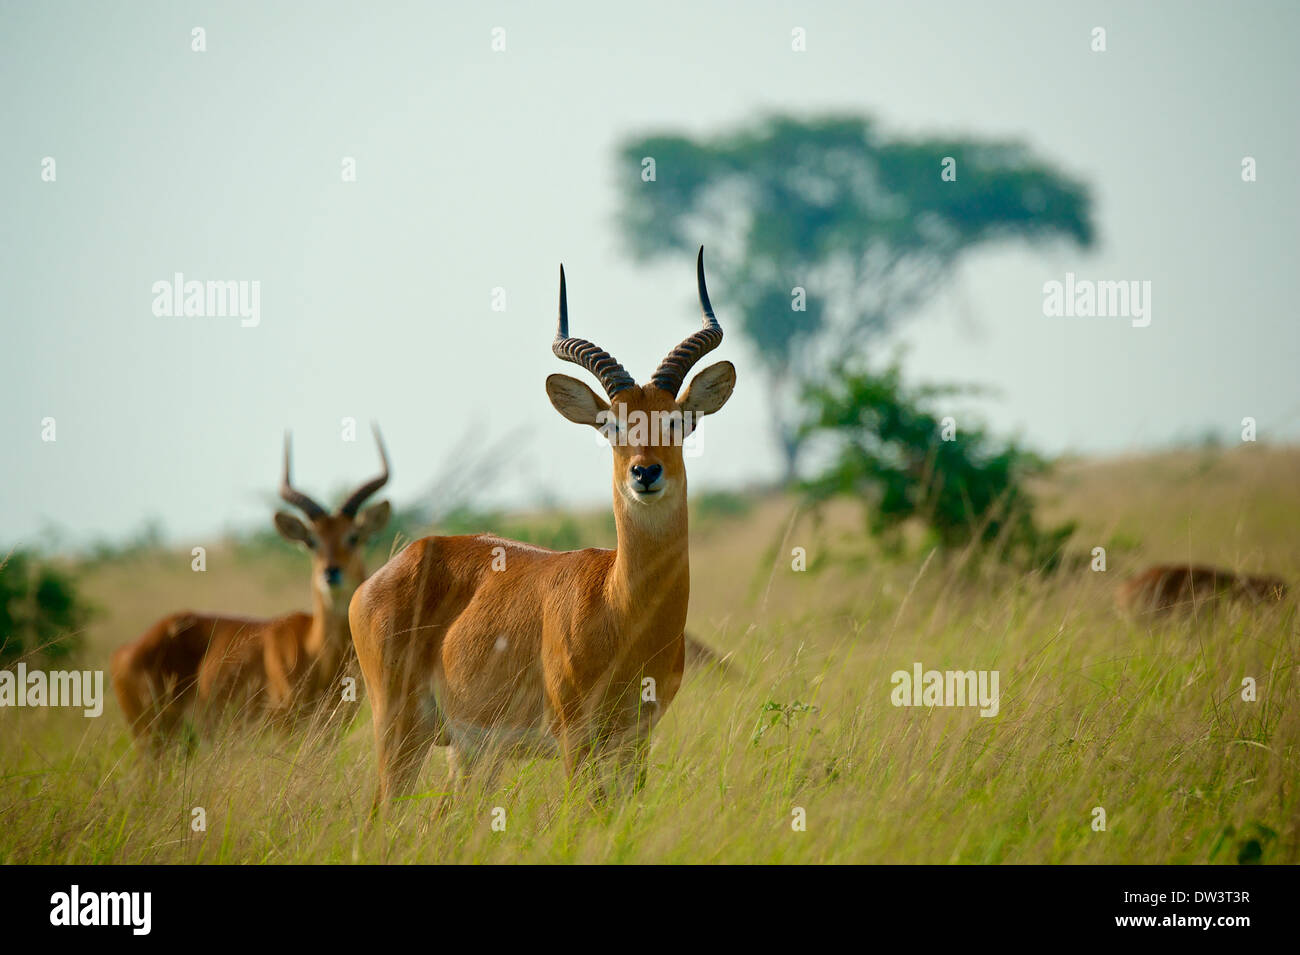 Watchful male Ugandan kobs (Kobus kob thomasi) on the Ugandan savannah. A small herd of kob. - Stock Image